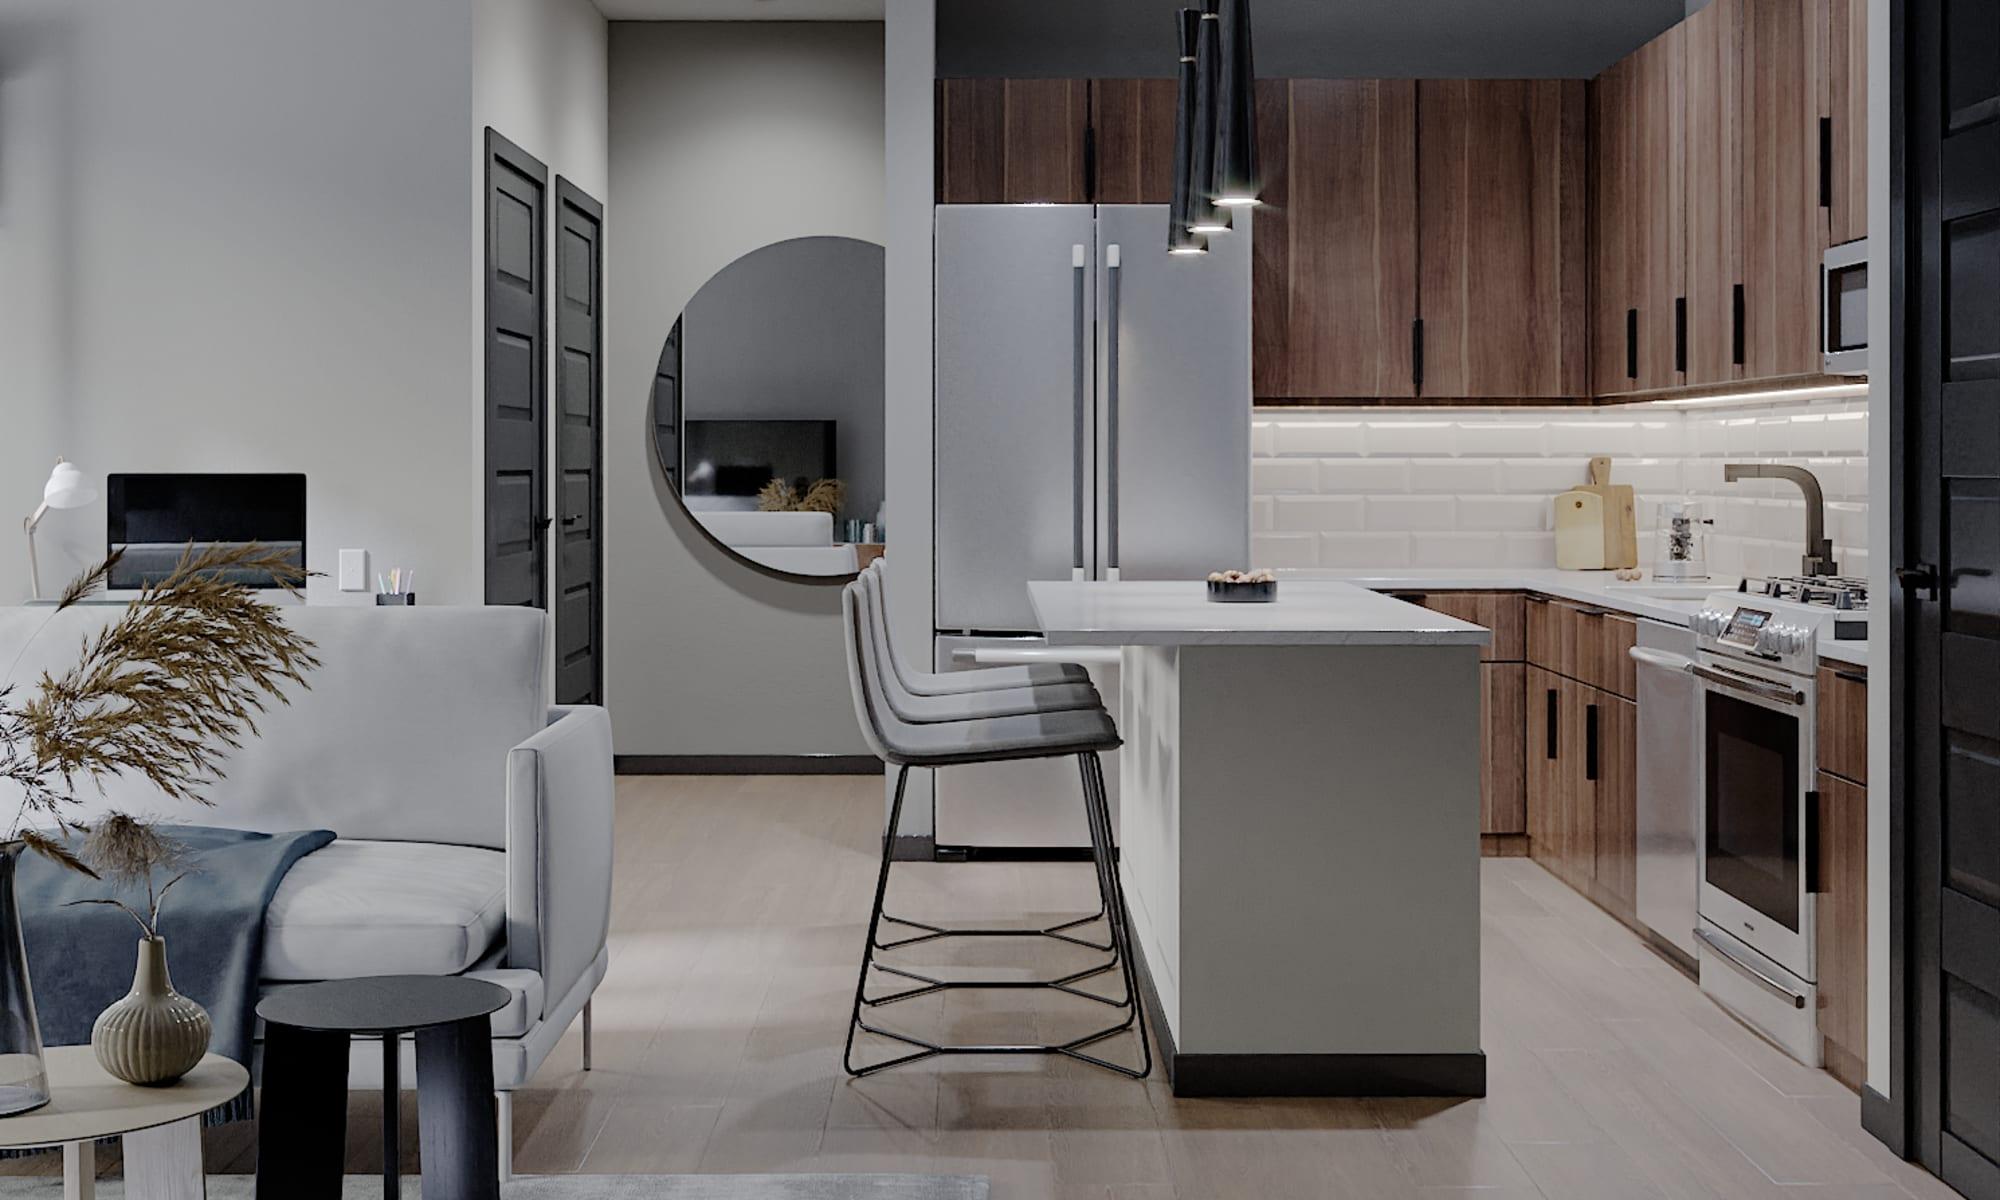 Luxury apartments at Solana Stapleton Apartments in Denver, Colorado